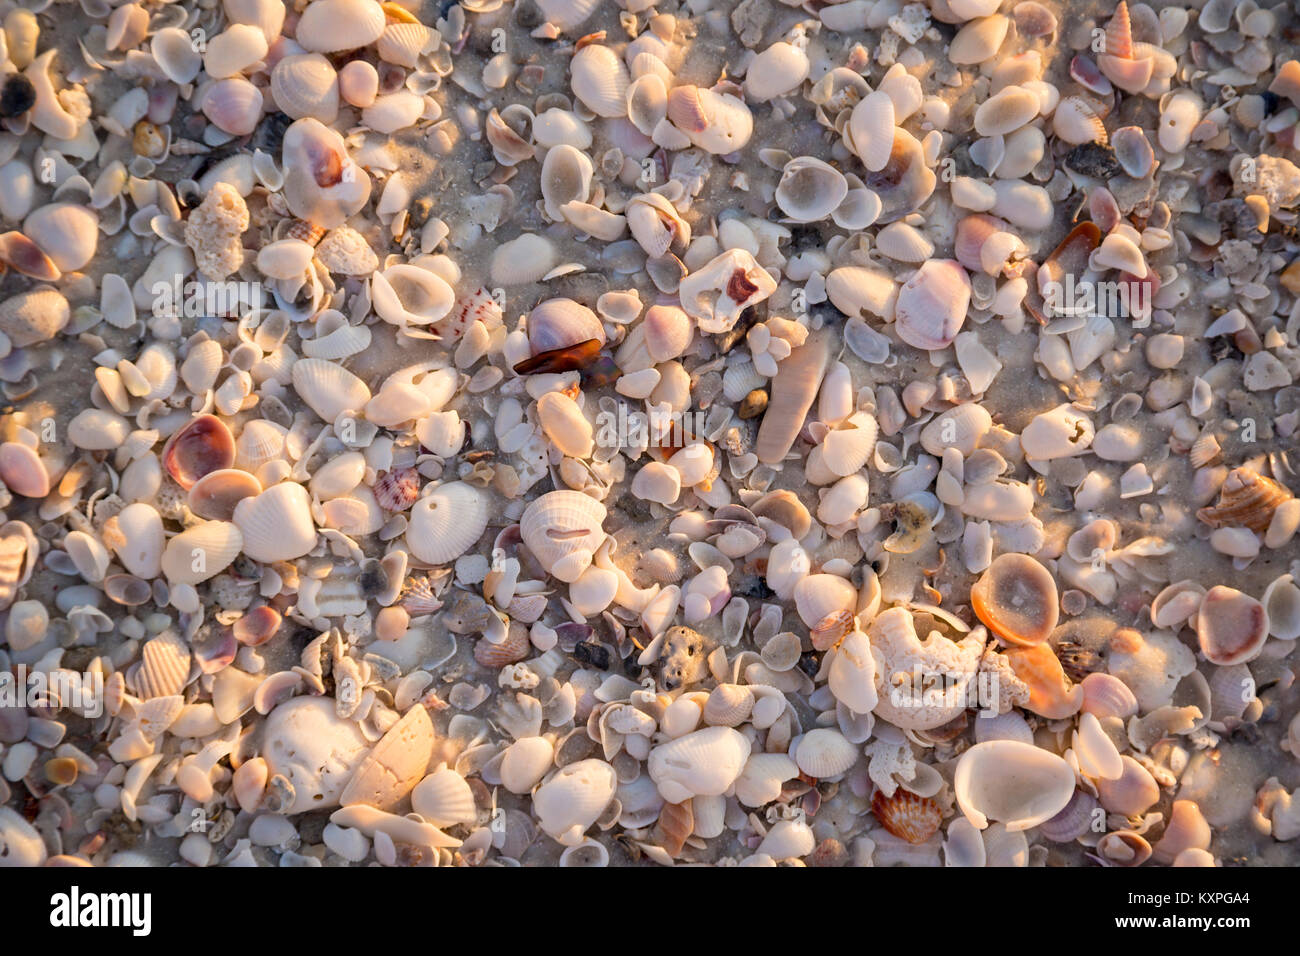 Conchas de Mar en una playa de arena fina, Barefoot Beach, Naples, Florida, EE.UU. Foto de stock